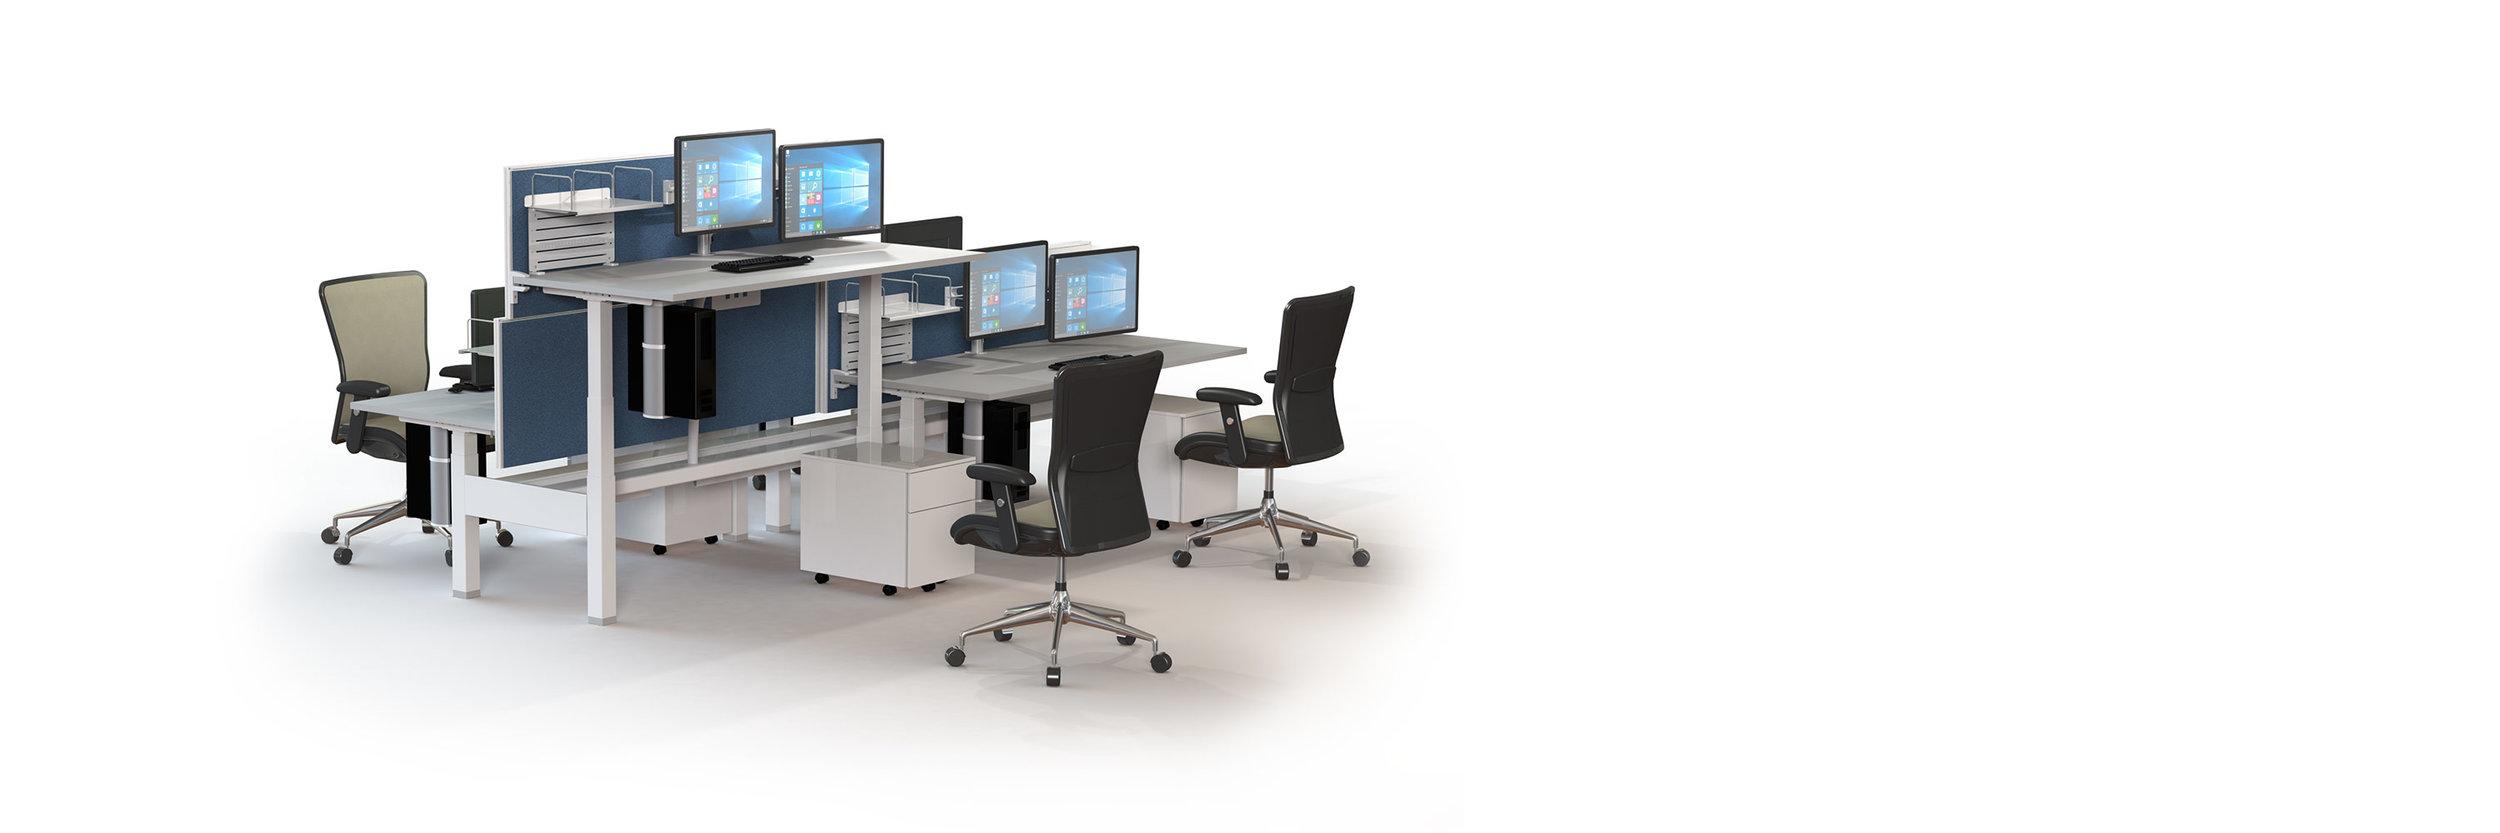 Workstations - Team furniture